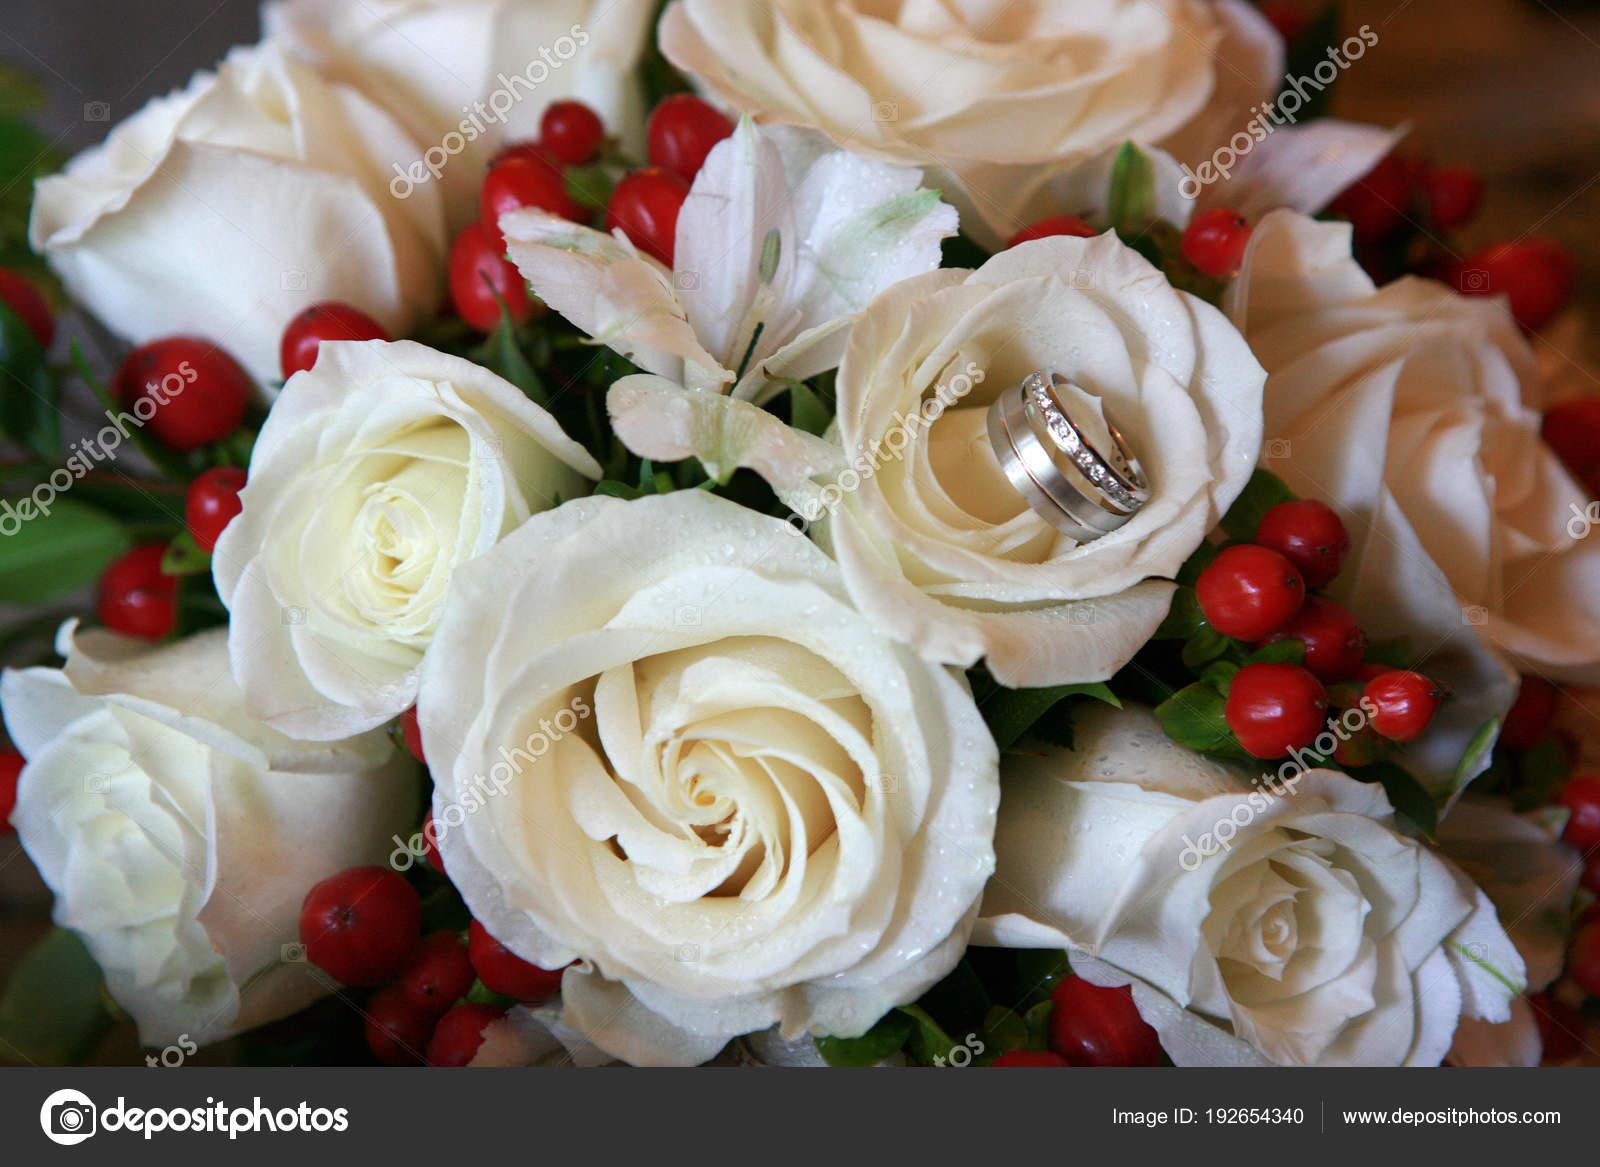 Wedding bouquet with wedding rings stock photo beckerphotos beautiful white roses wedding bouquet with the wedding rings in one flower photo by beckerphotos izmirmasajfo